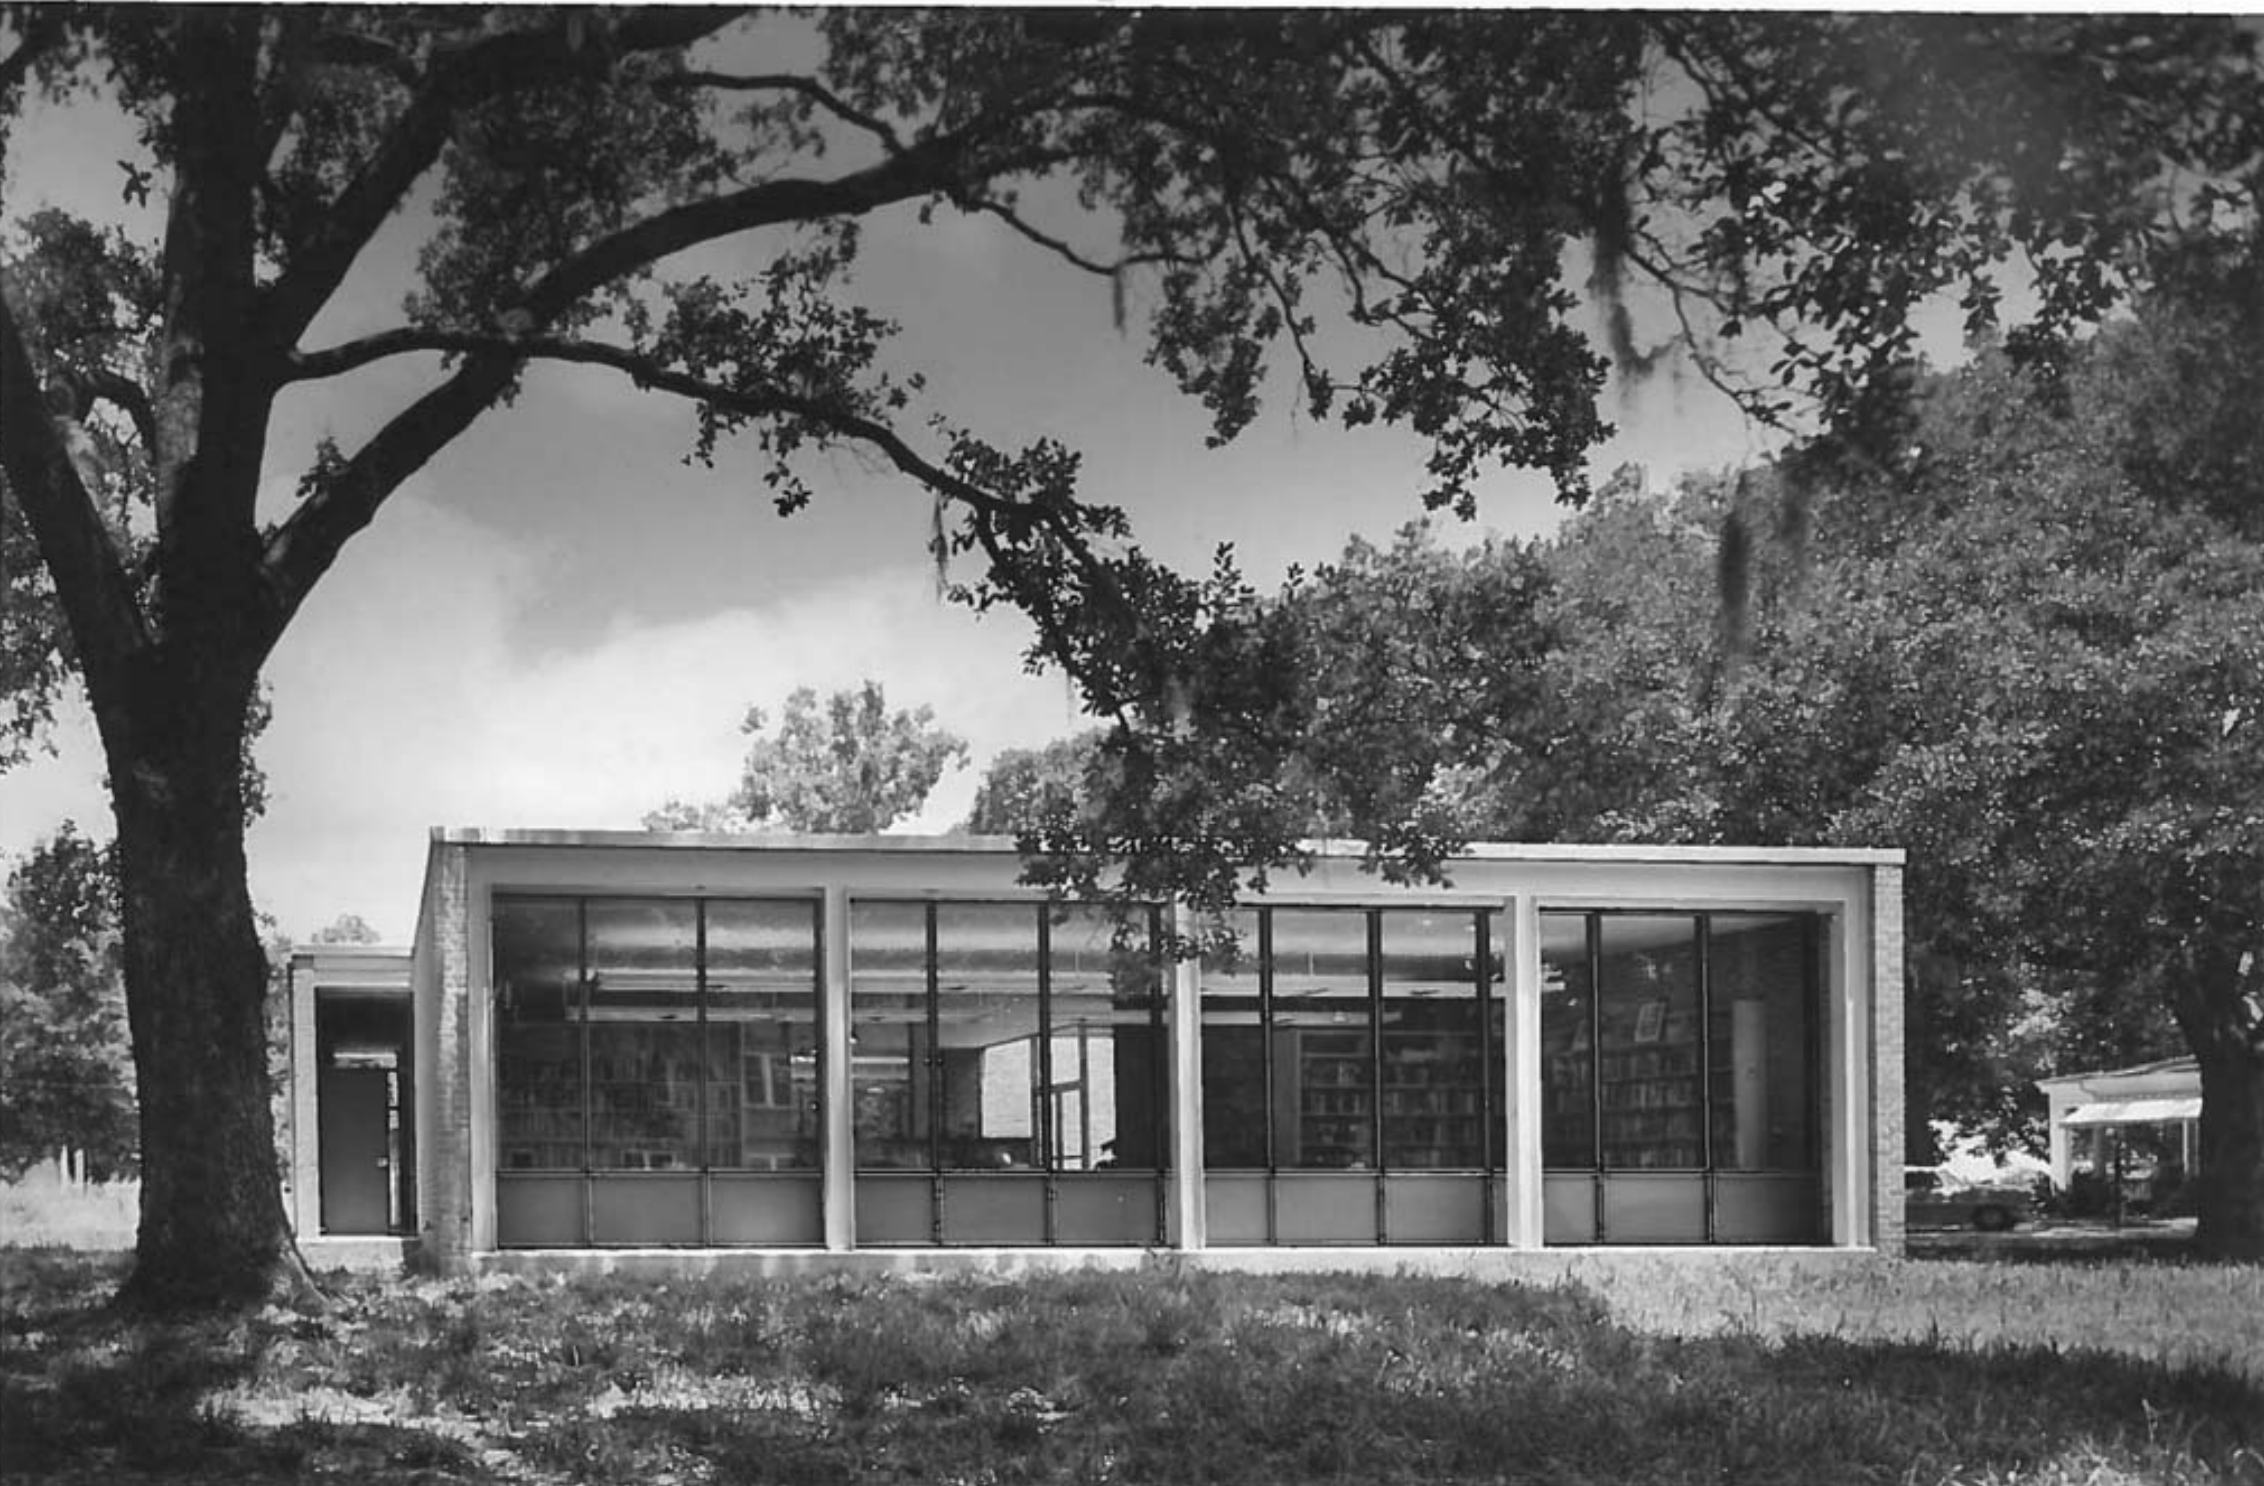 LIBRARY_Desmond_Miller Memorial Library_1957.png